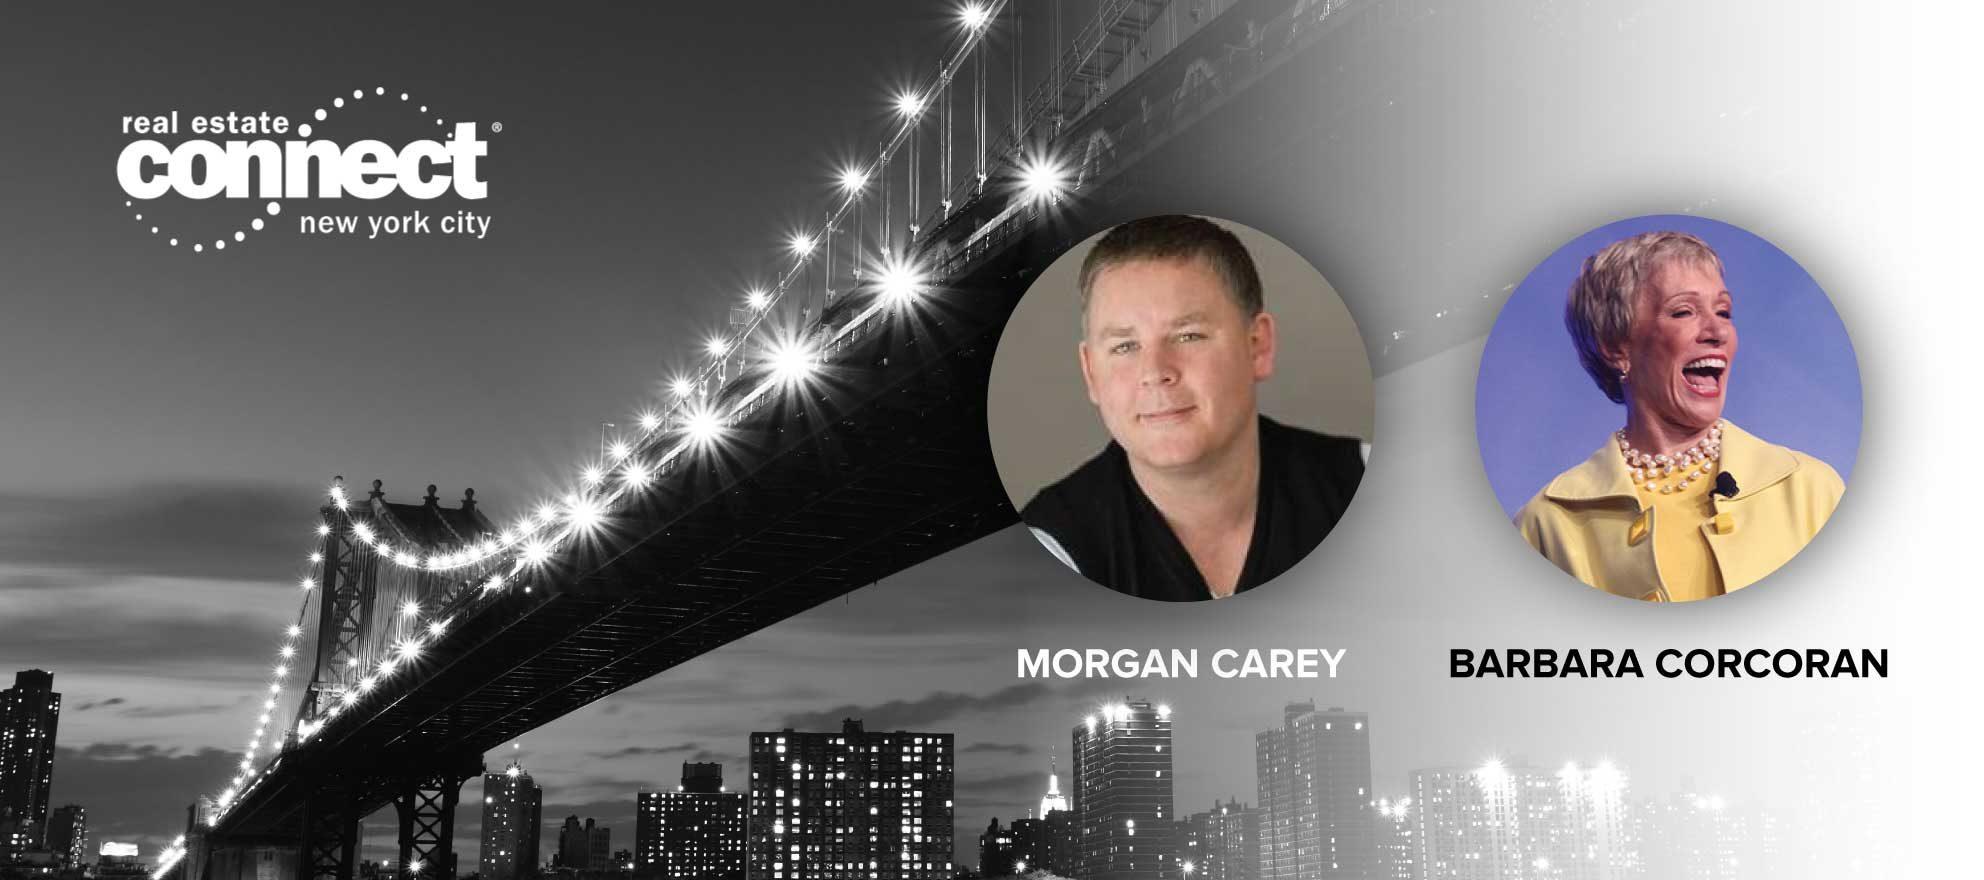 Barbara Corcoran backs real estate website provider